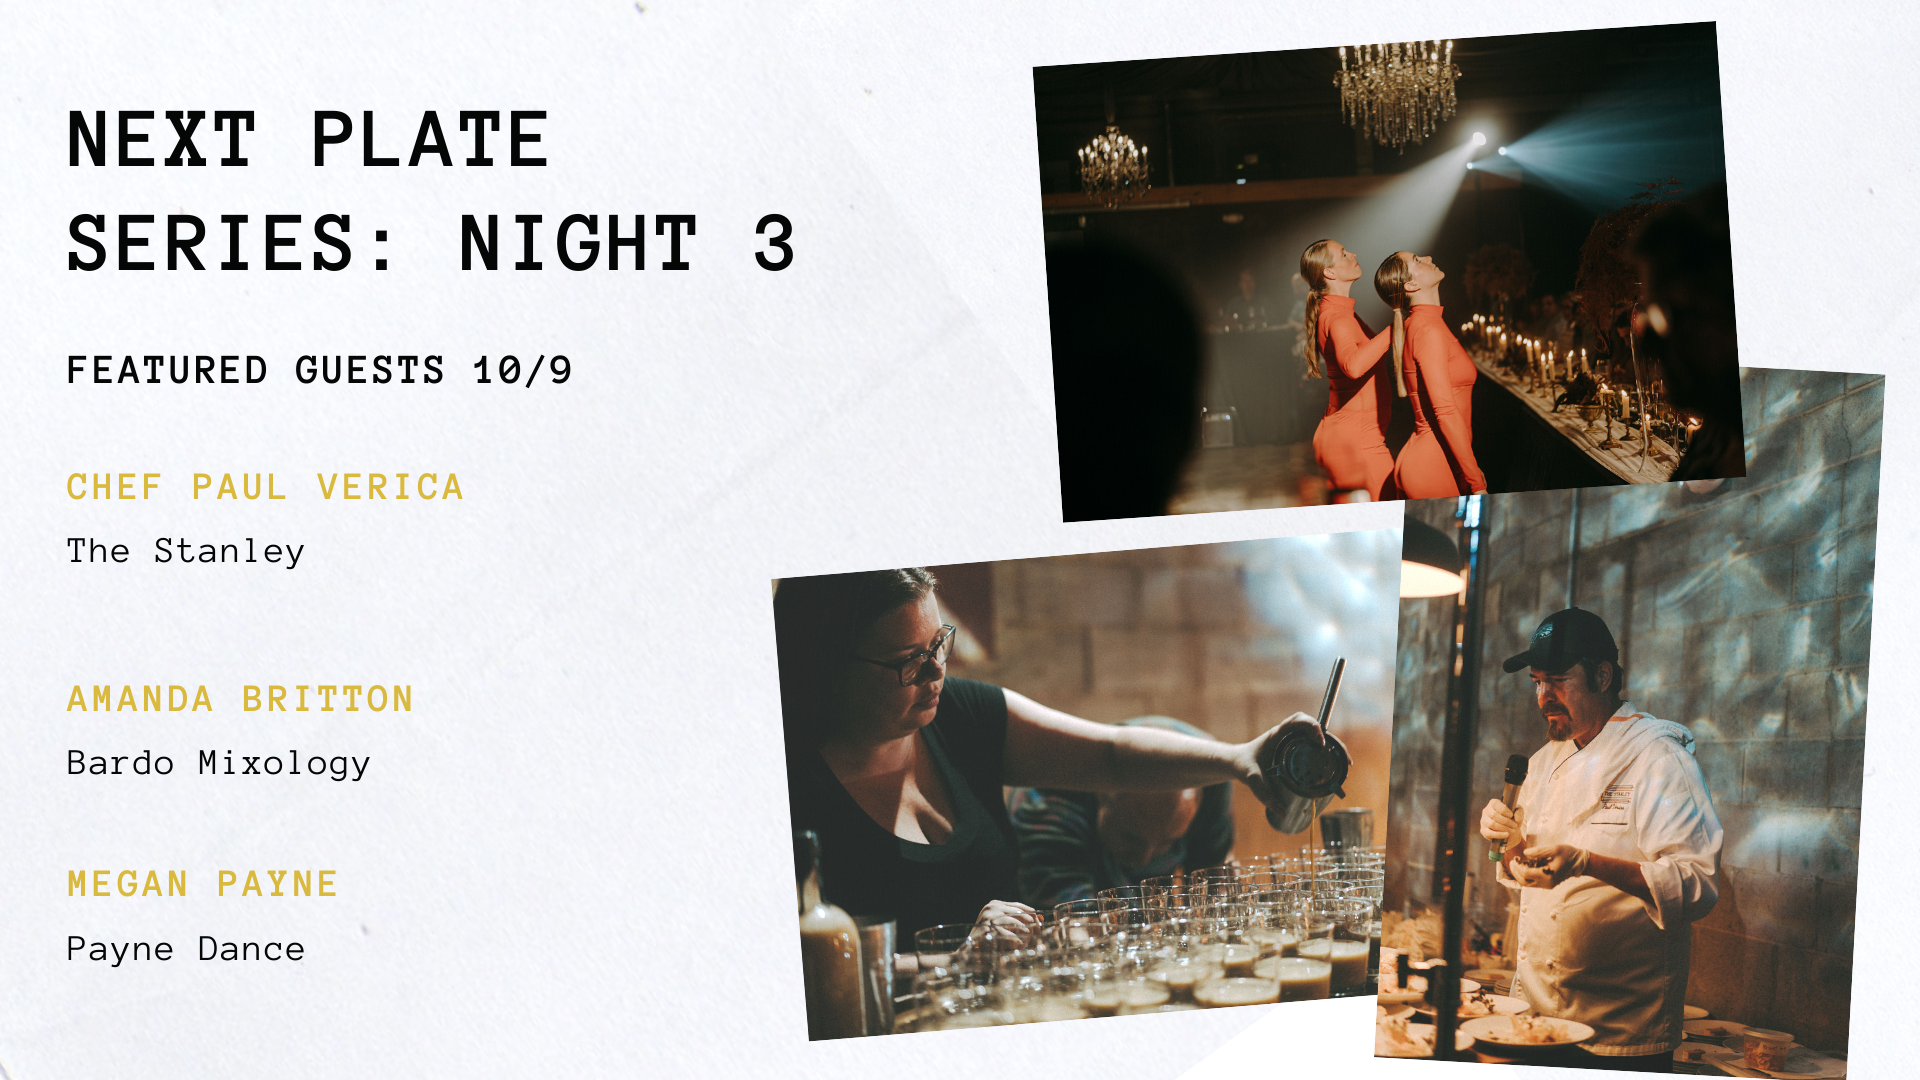 Night 3: Next Plate Series